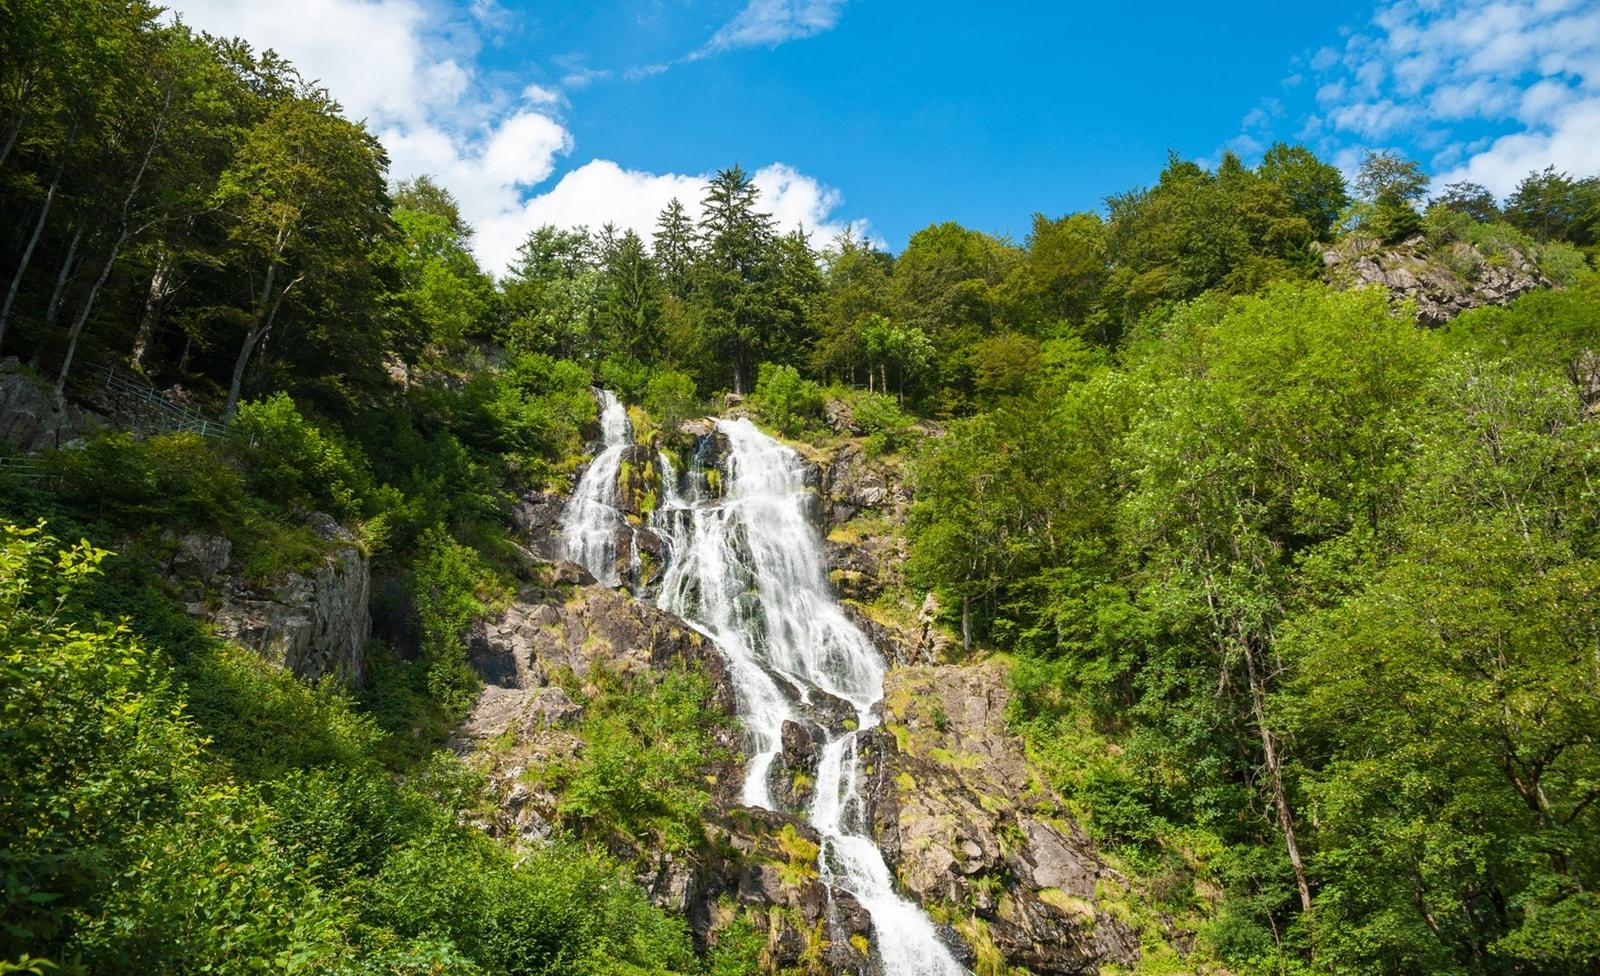 Wasserfall in Todtnau